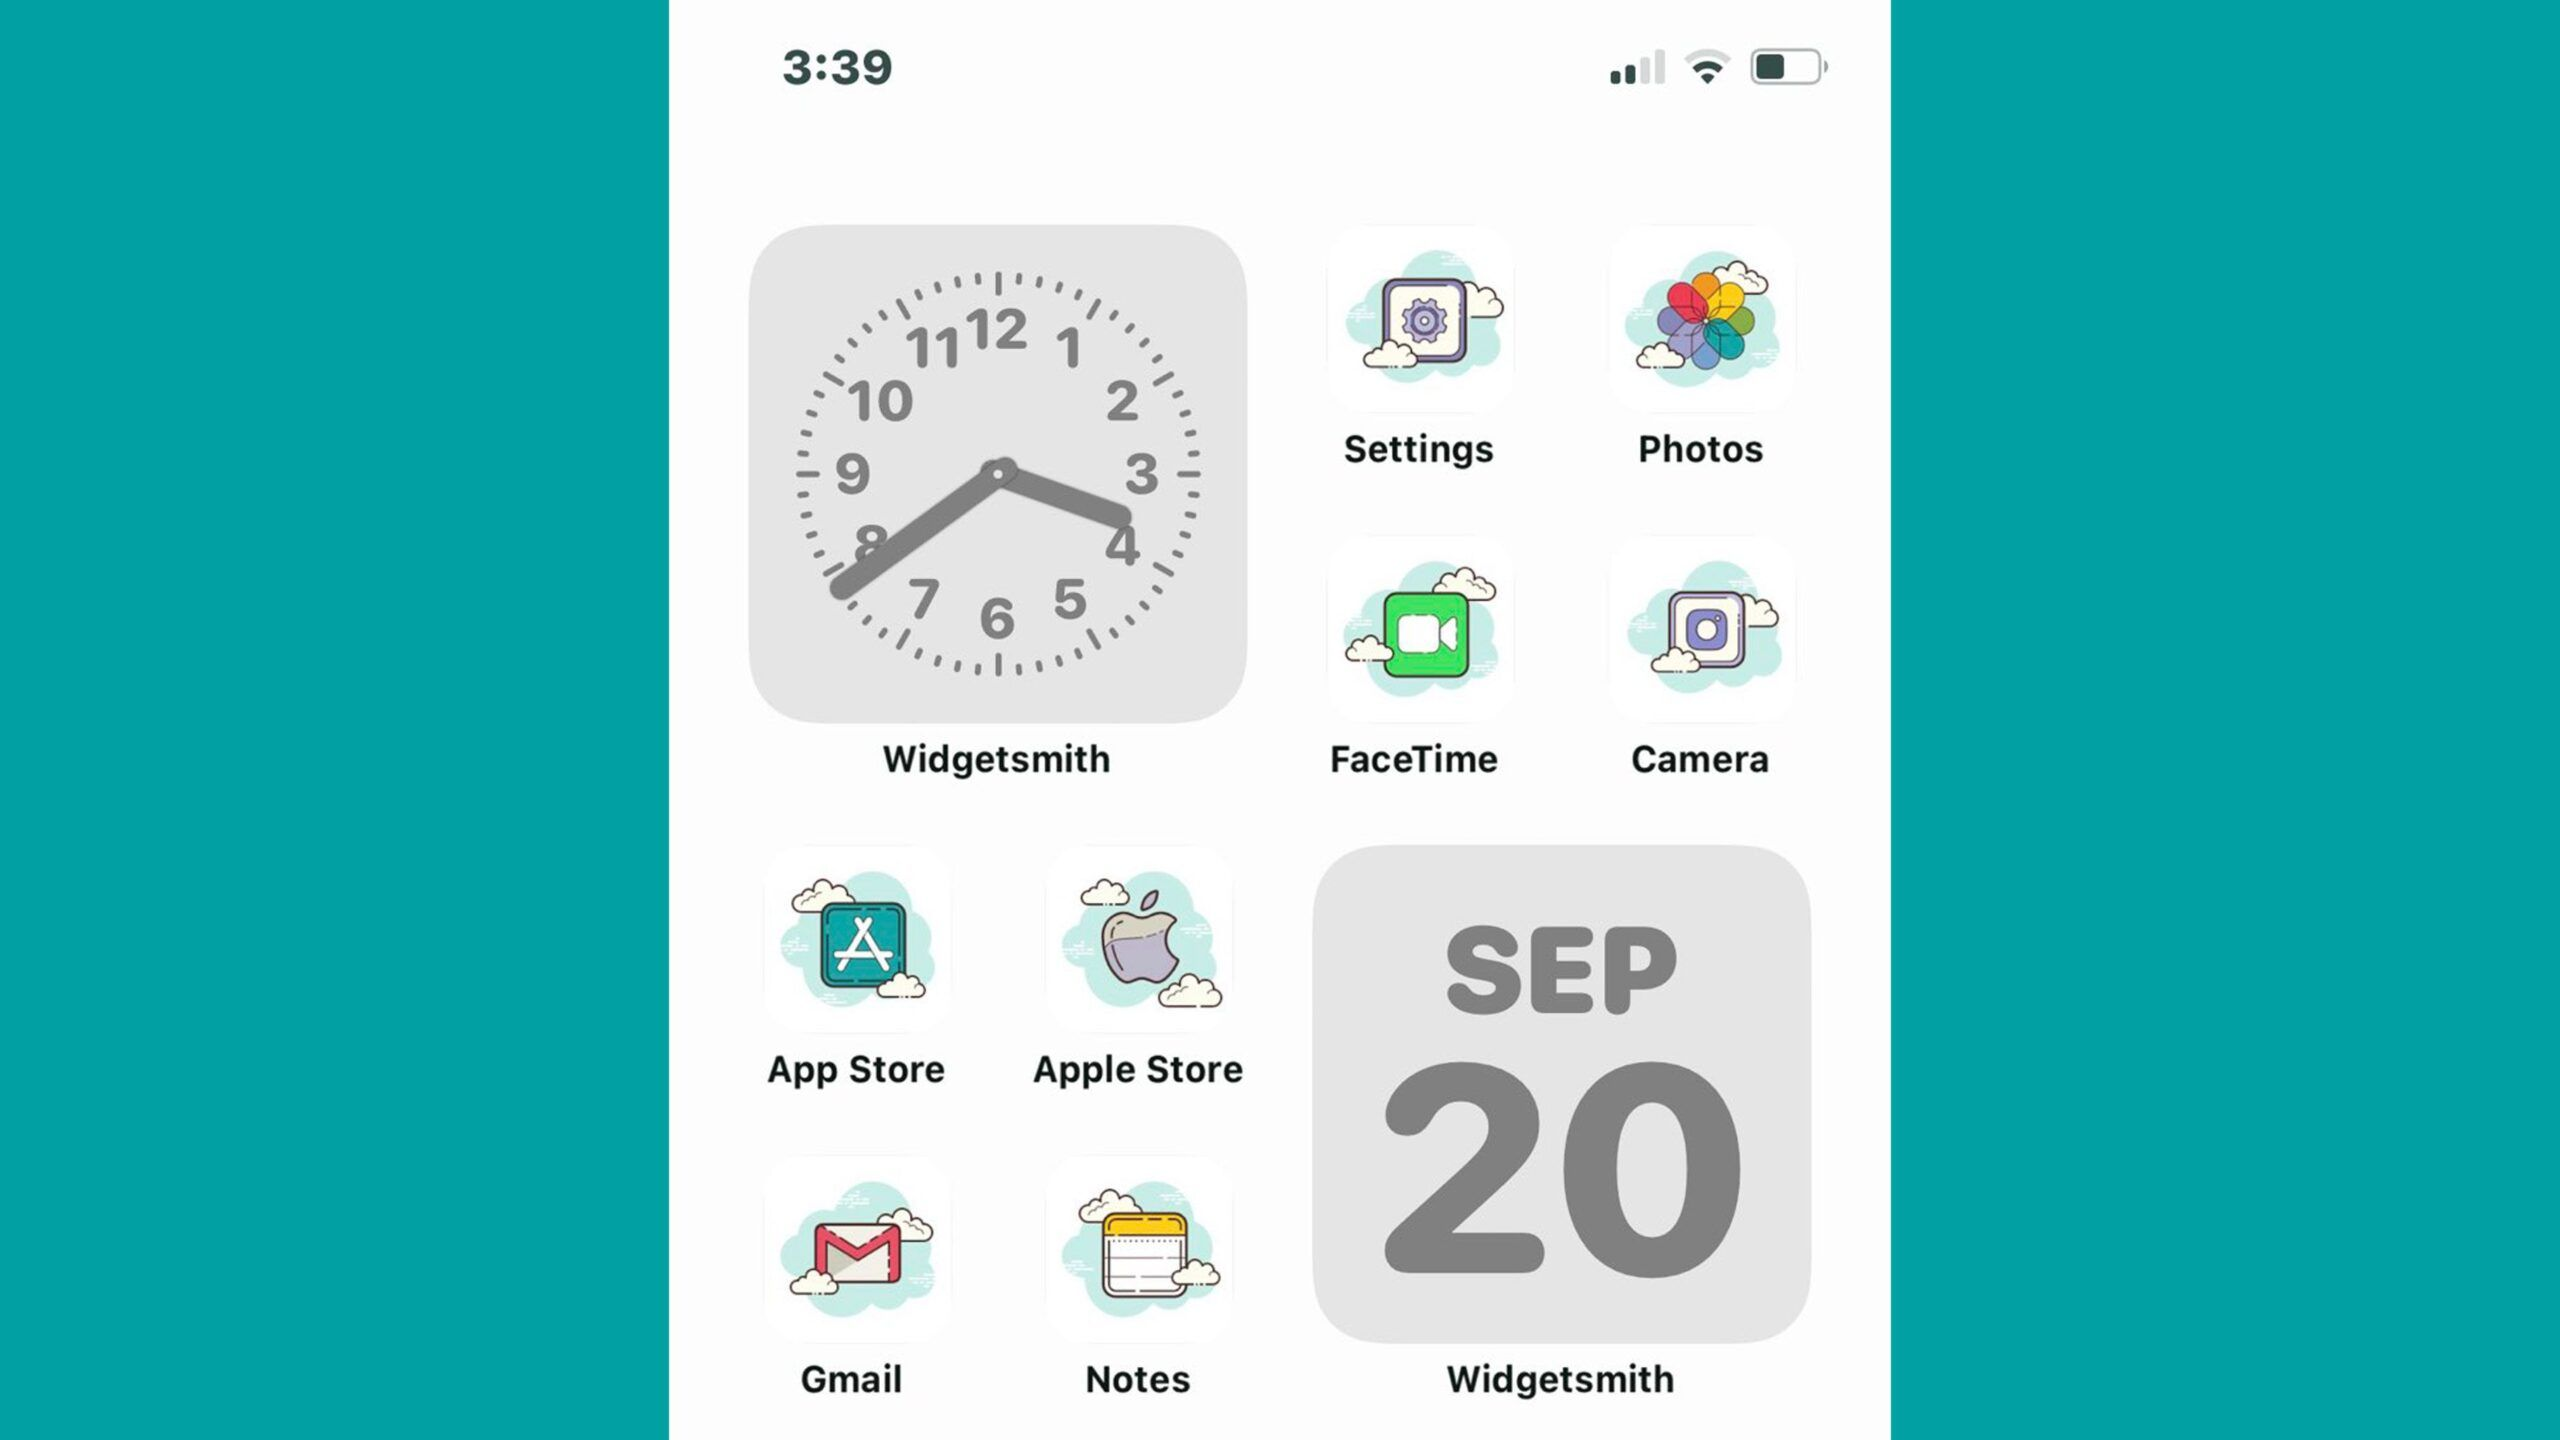 iOS 14 Widgets Offer iPhone Users Creative Home Screen